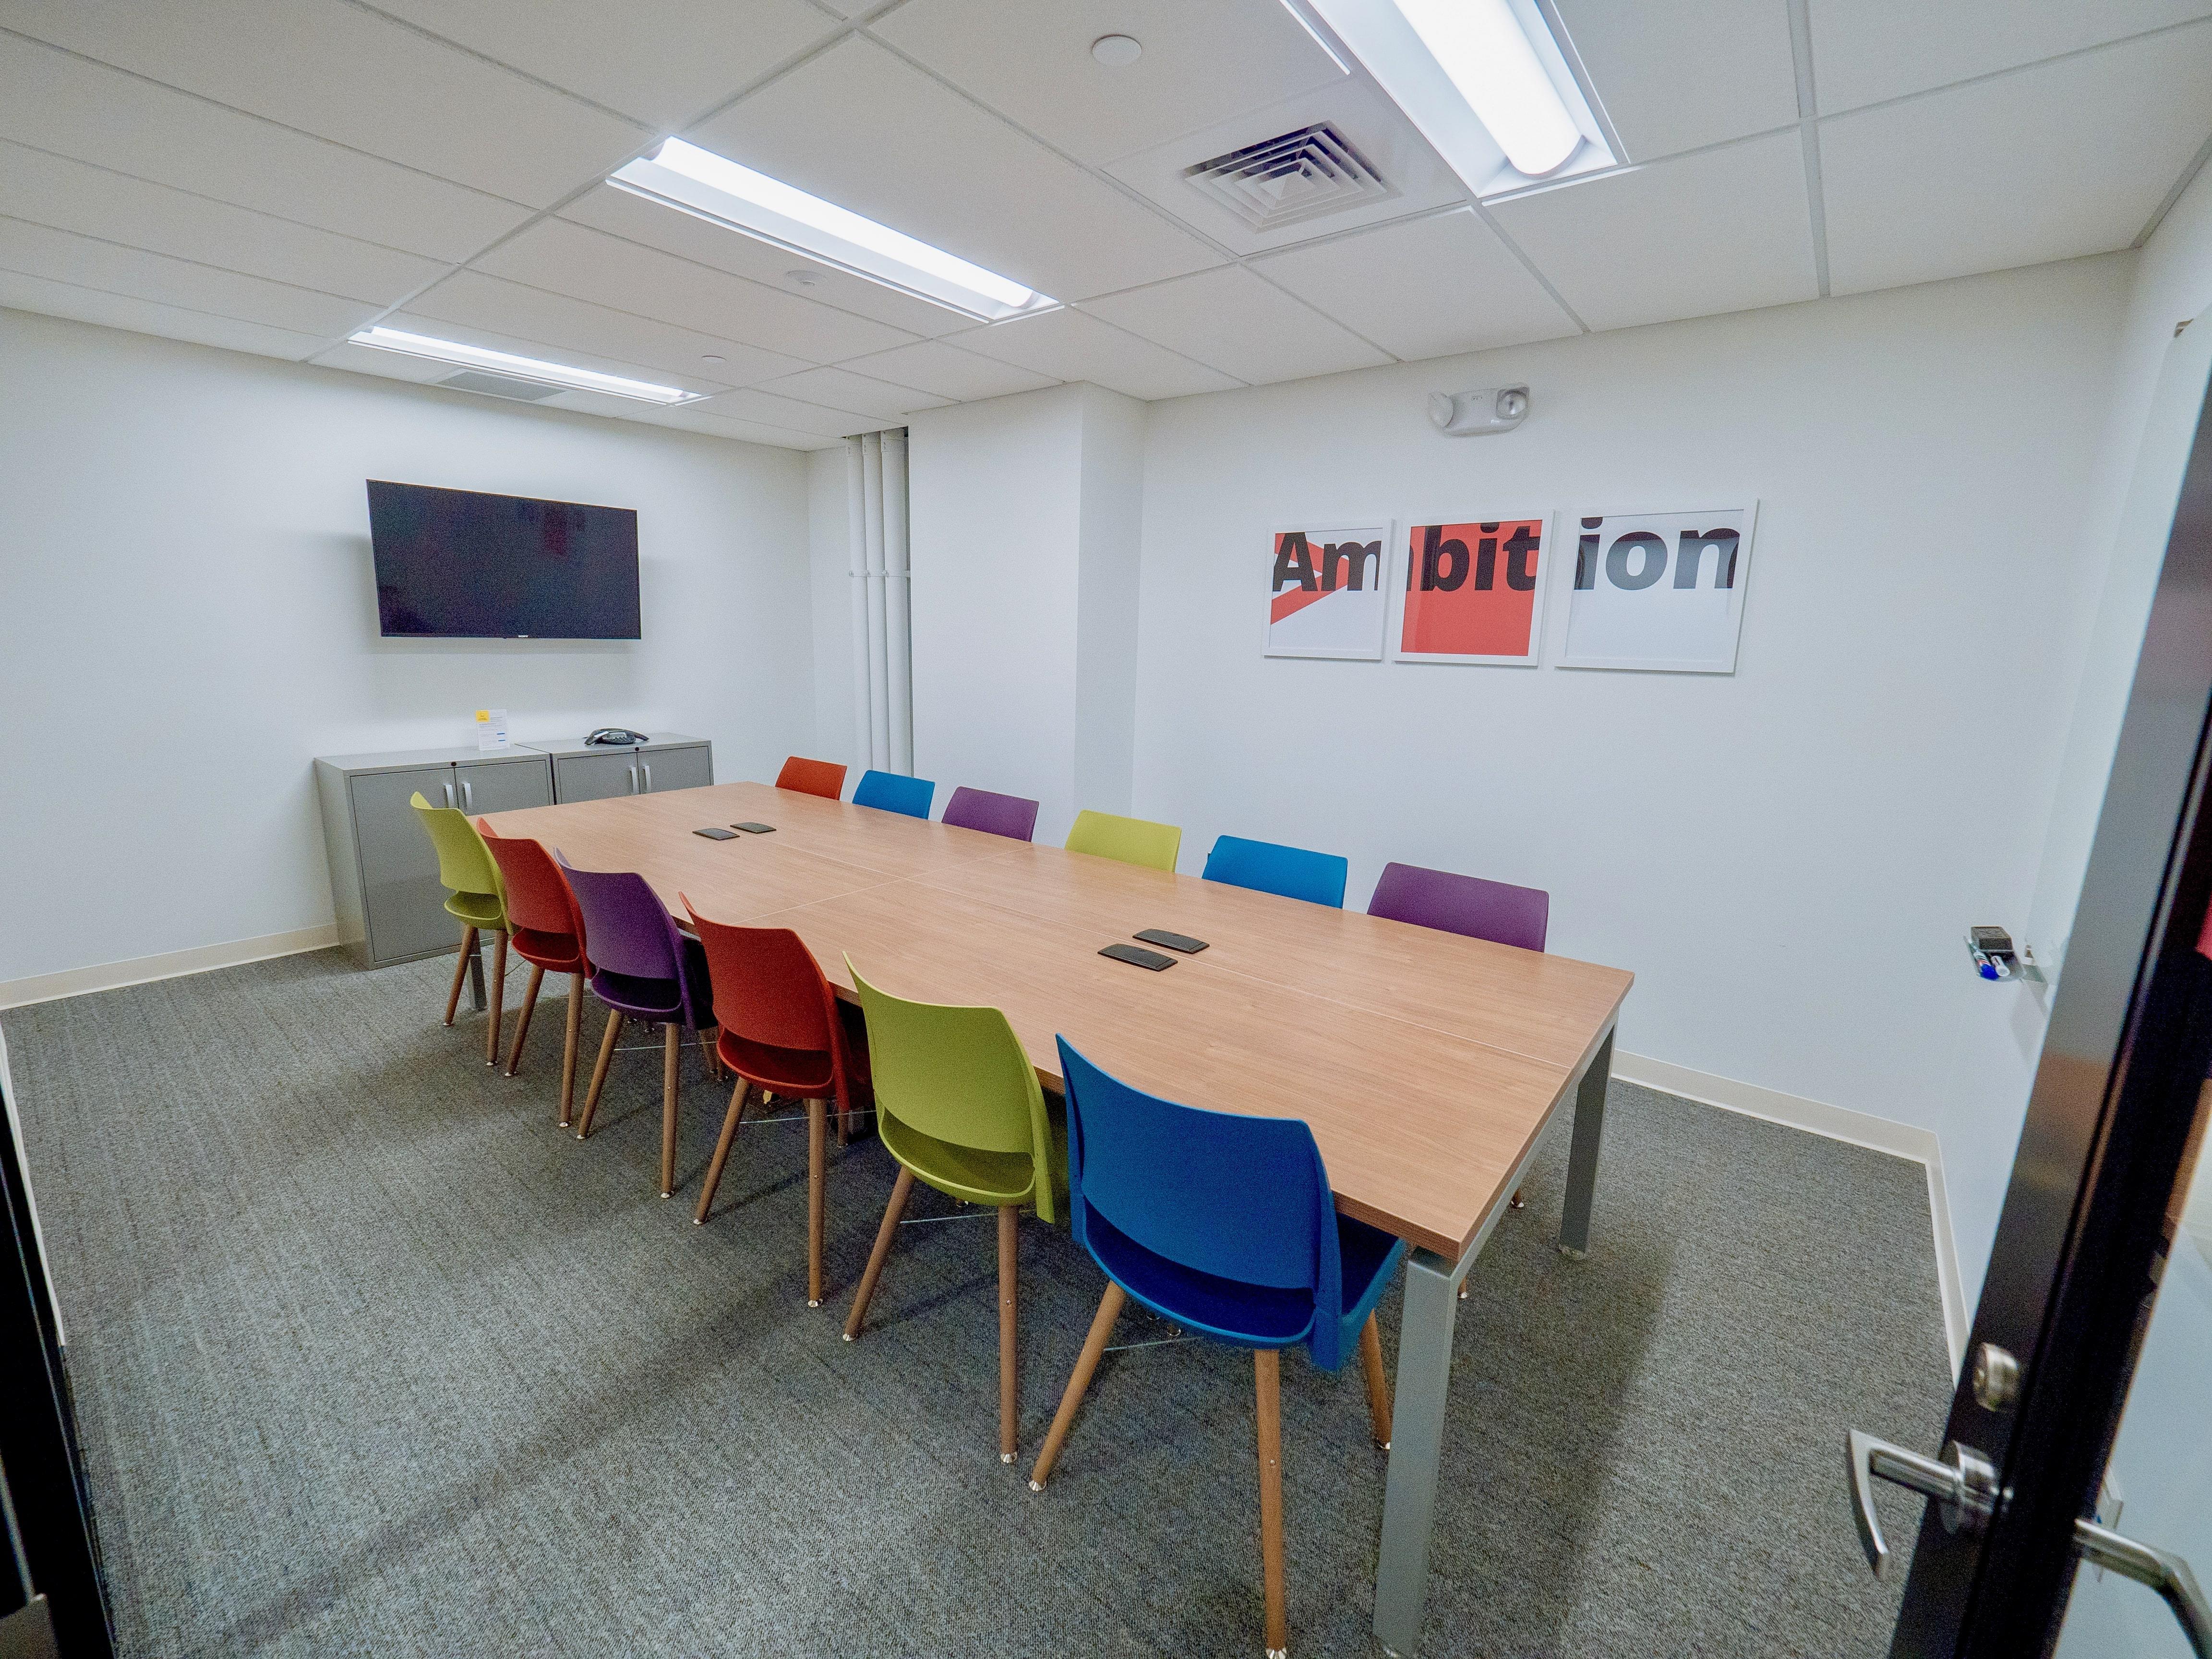 Upward Hartford - Ambition Conference Room